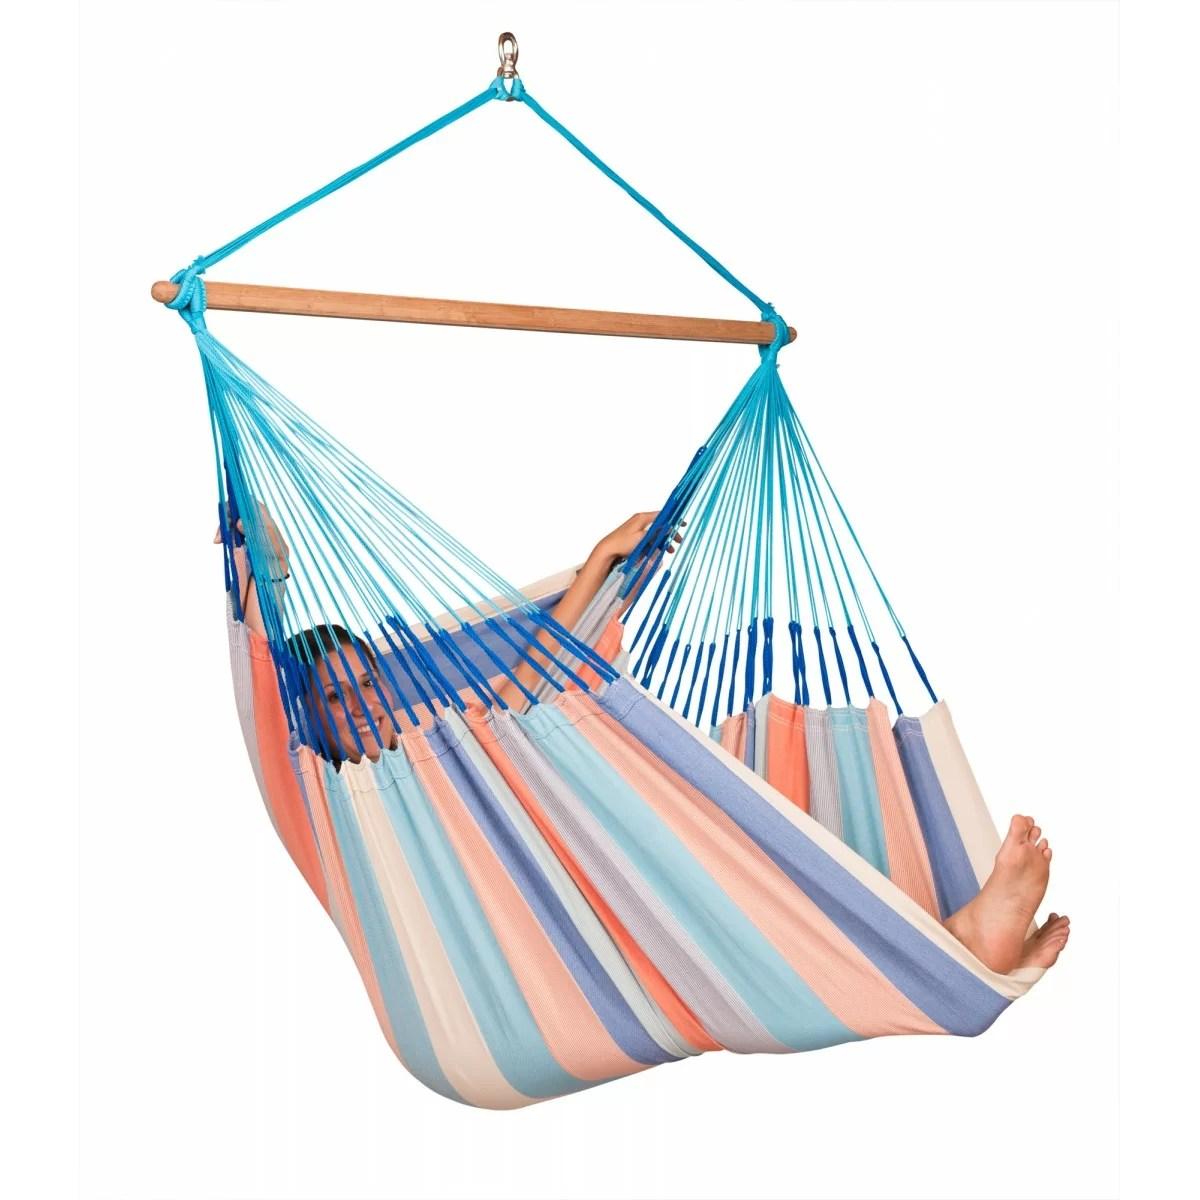 la siesta hammock chair fabric padded folding chairs domingo weatherproof lounger